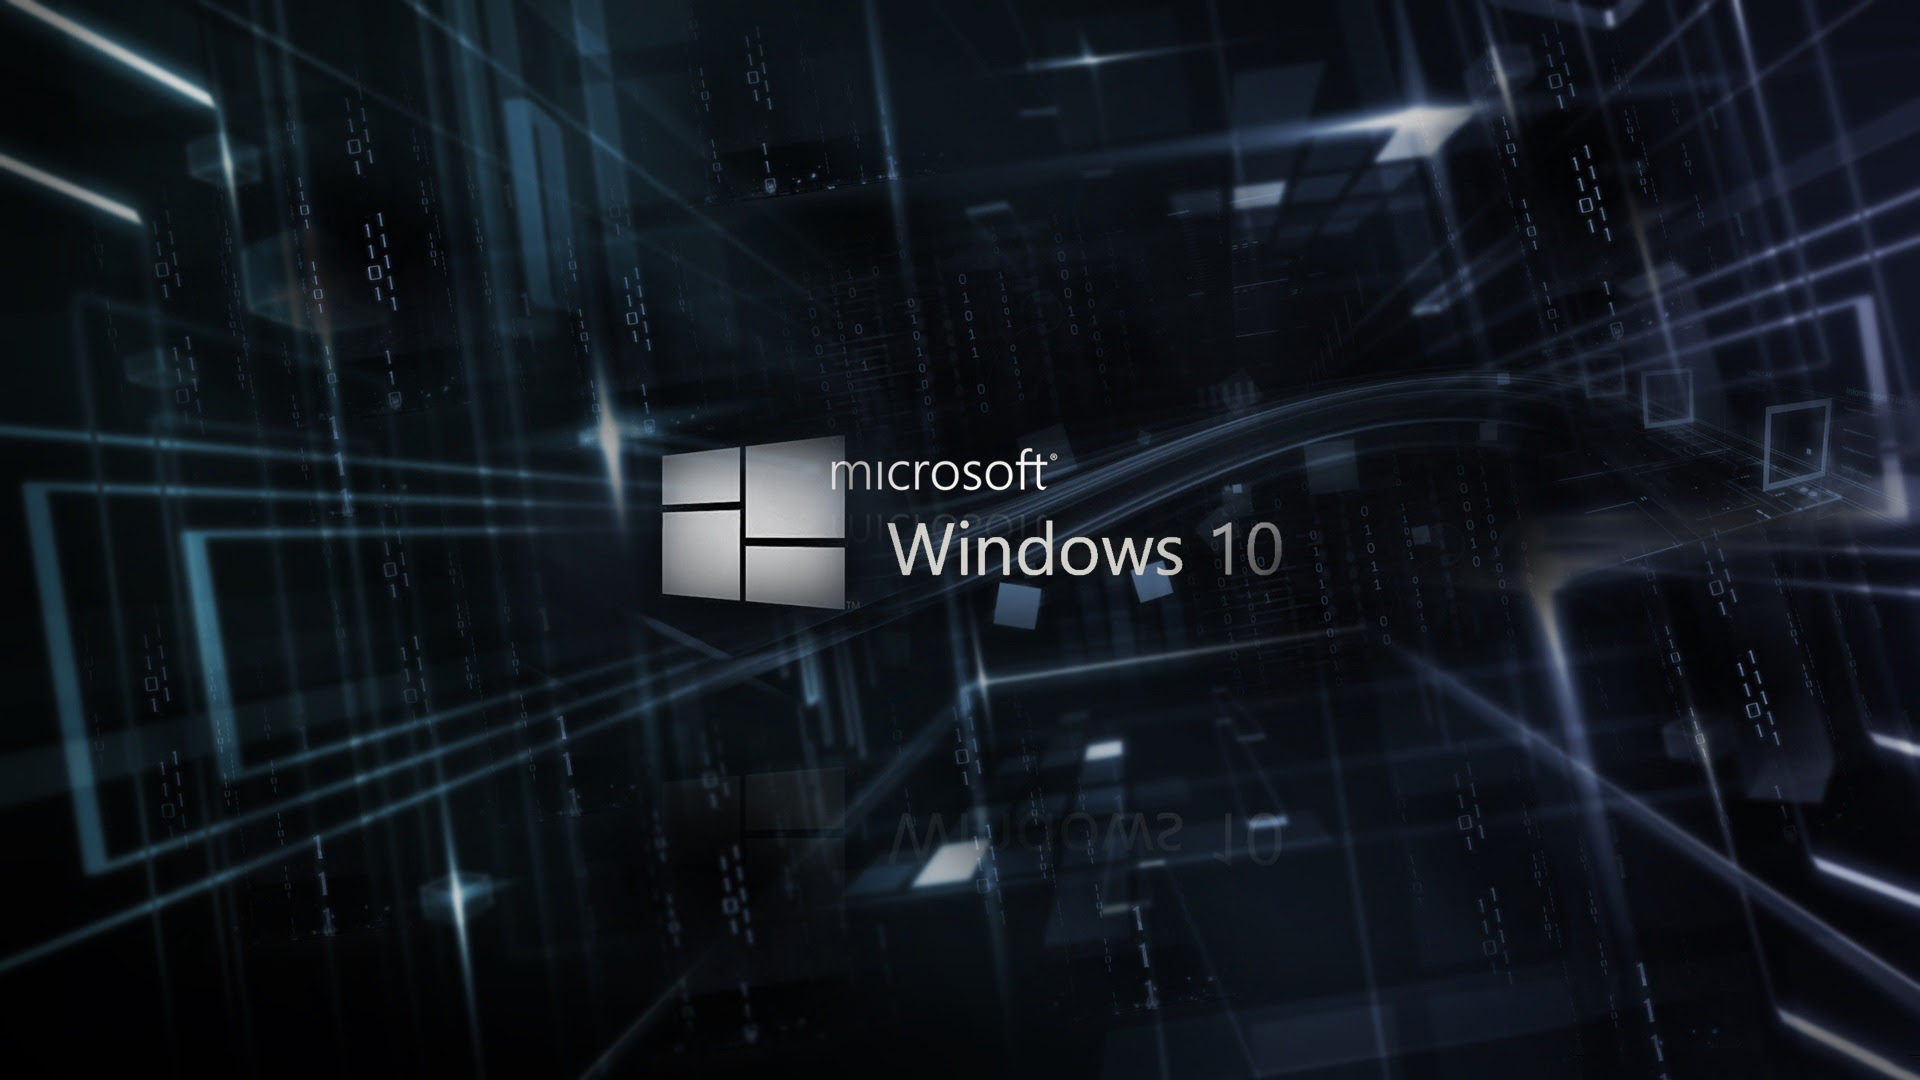 Hd Wallpaper Windows 10 Http Wallpapersko Com Hd Wallpaper Windows 10 Html Hd Wallpa Wallpaper Windows 10 Windows 10 Desktop Backgrounds Windows Wallpaper